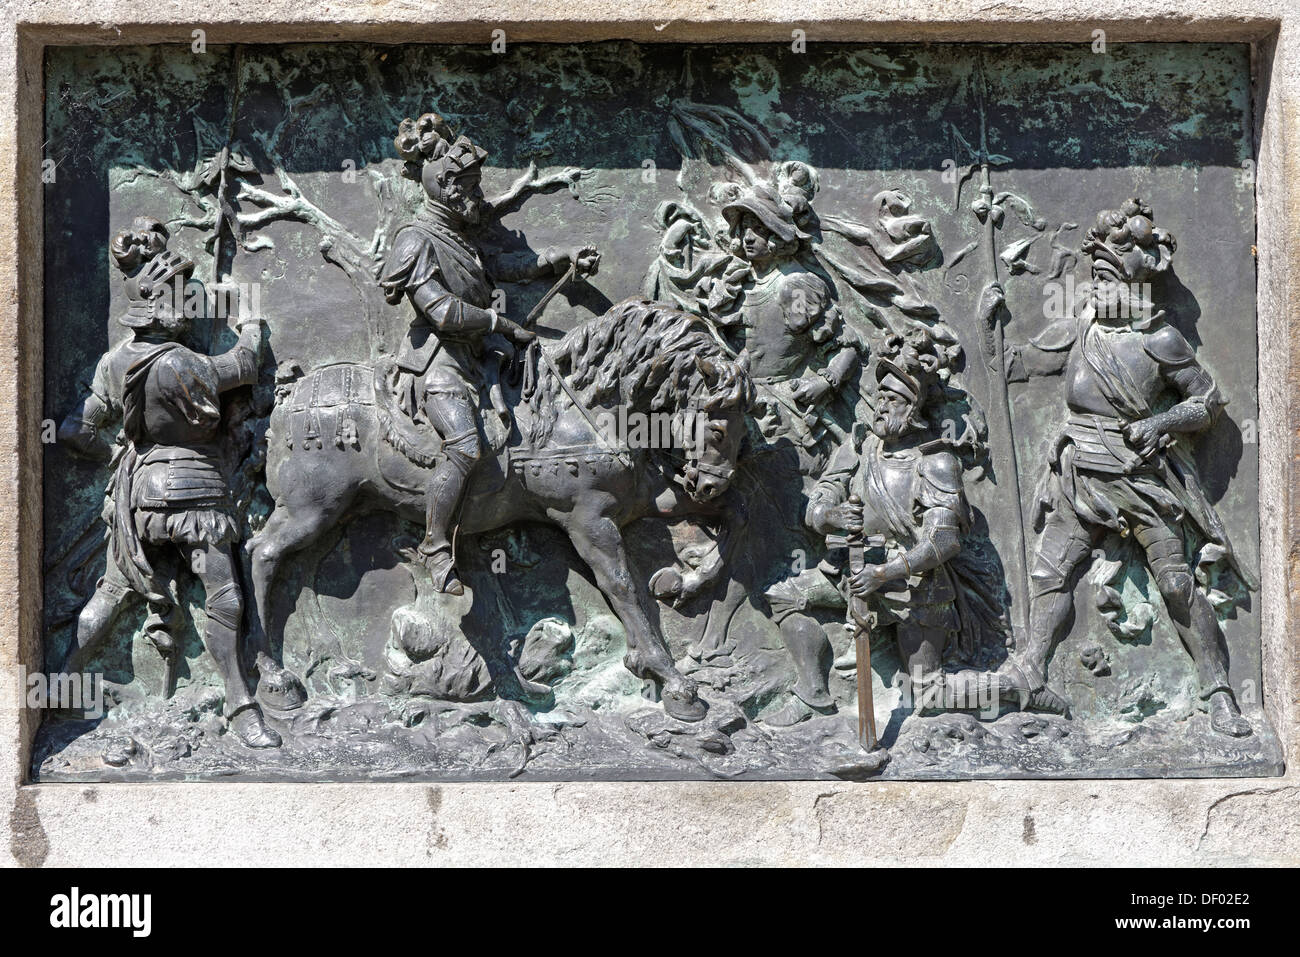 Winzerer memorial, Kaspar III. Winzerer, 1465-1542, caretaker, capture of the French king Francis I near Pavia, 1525 - Stock Image